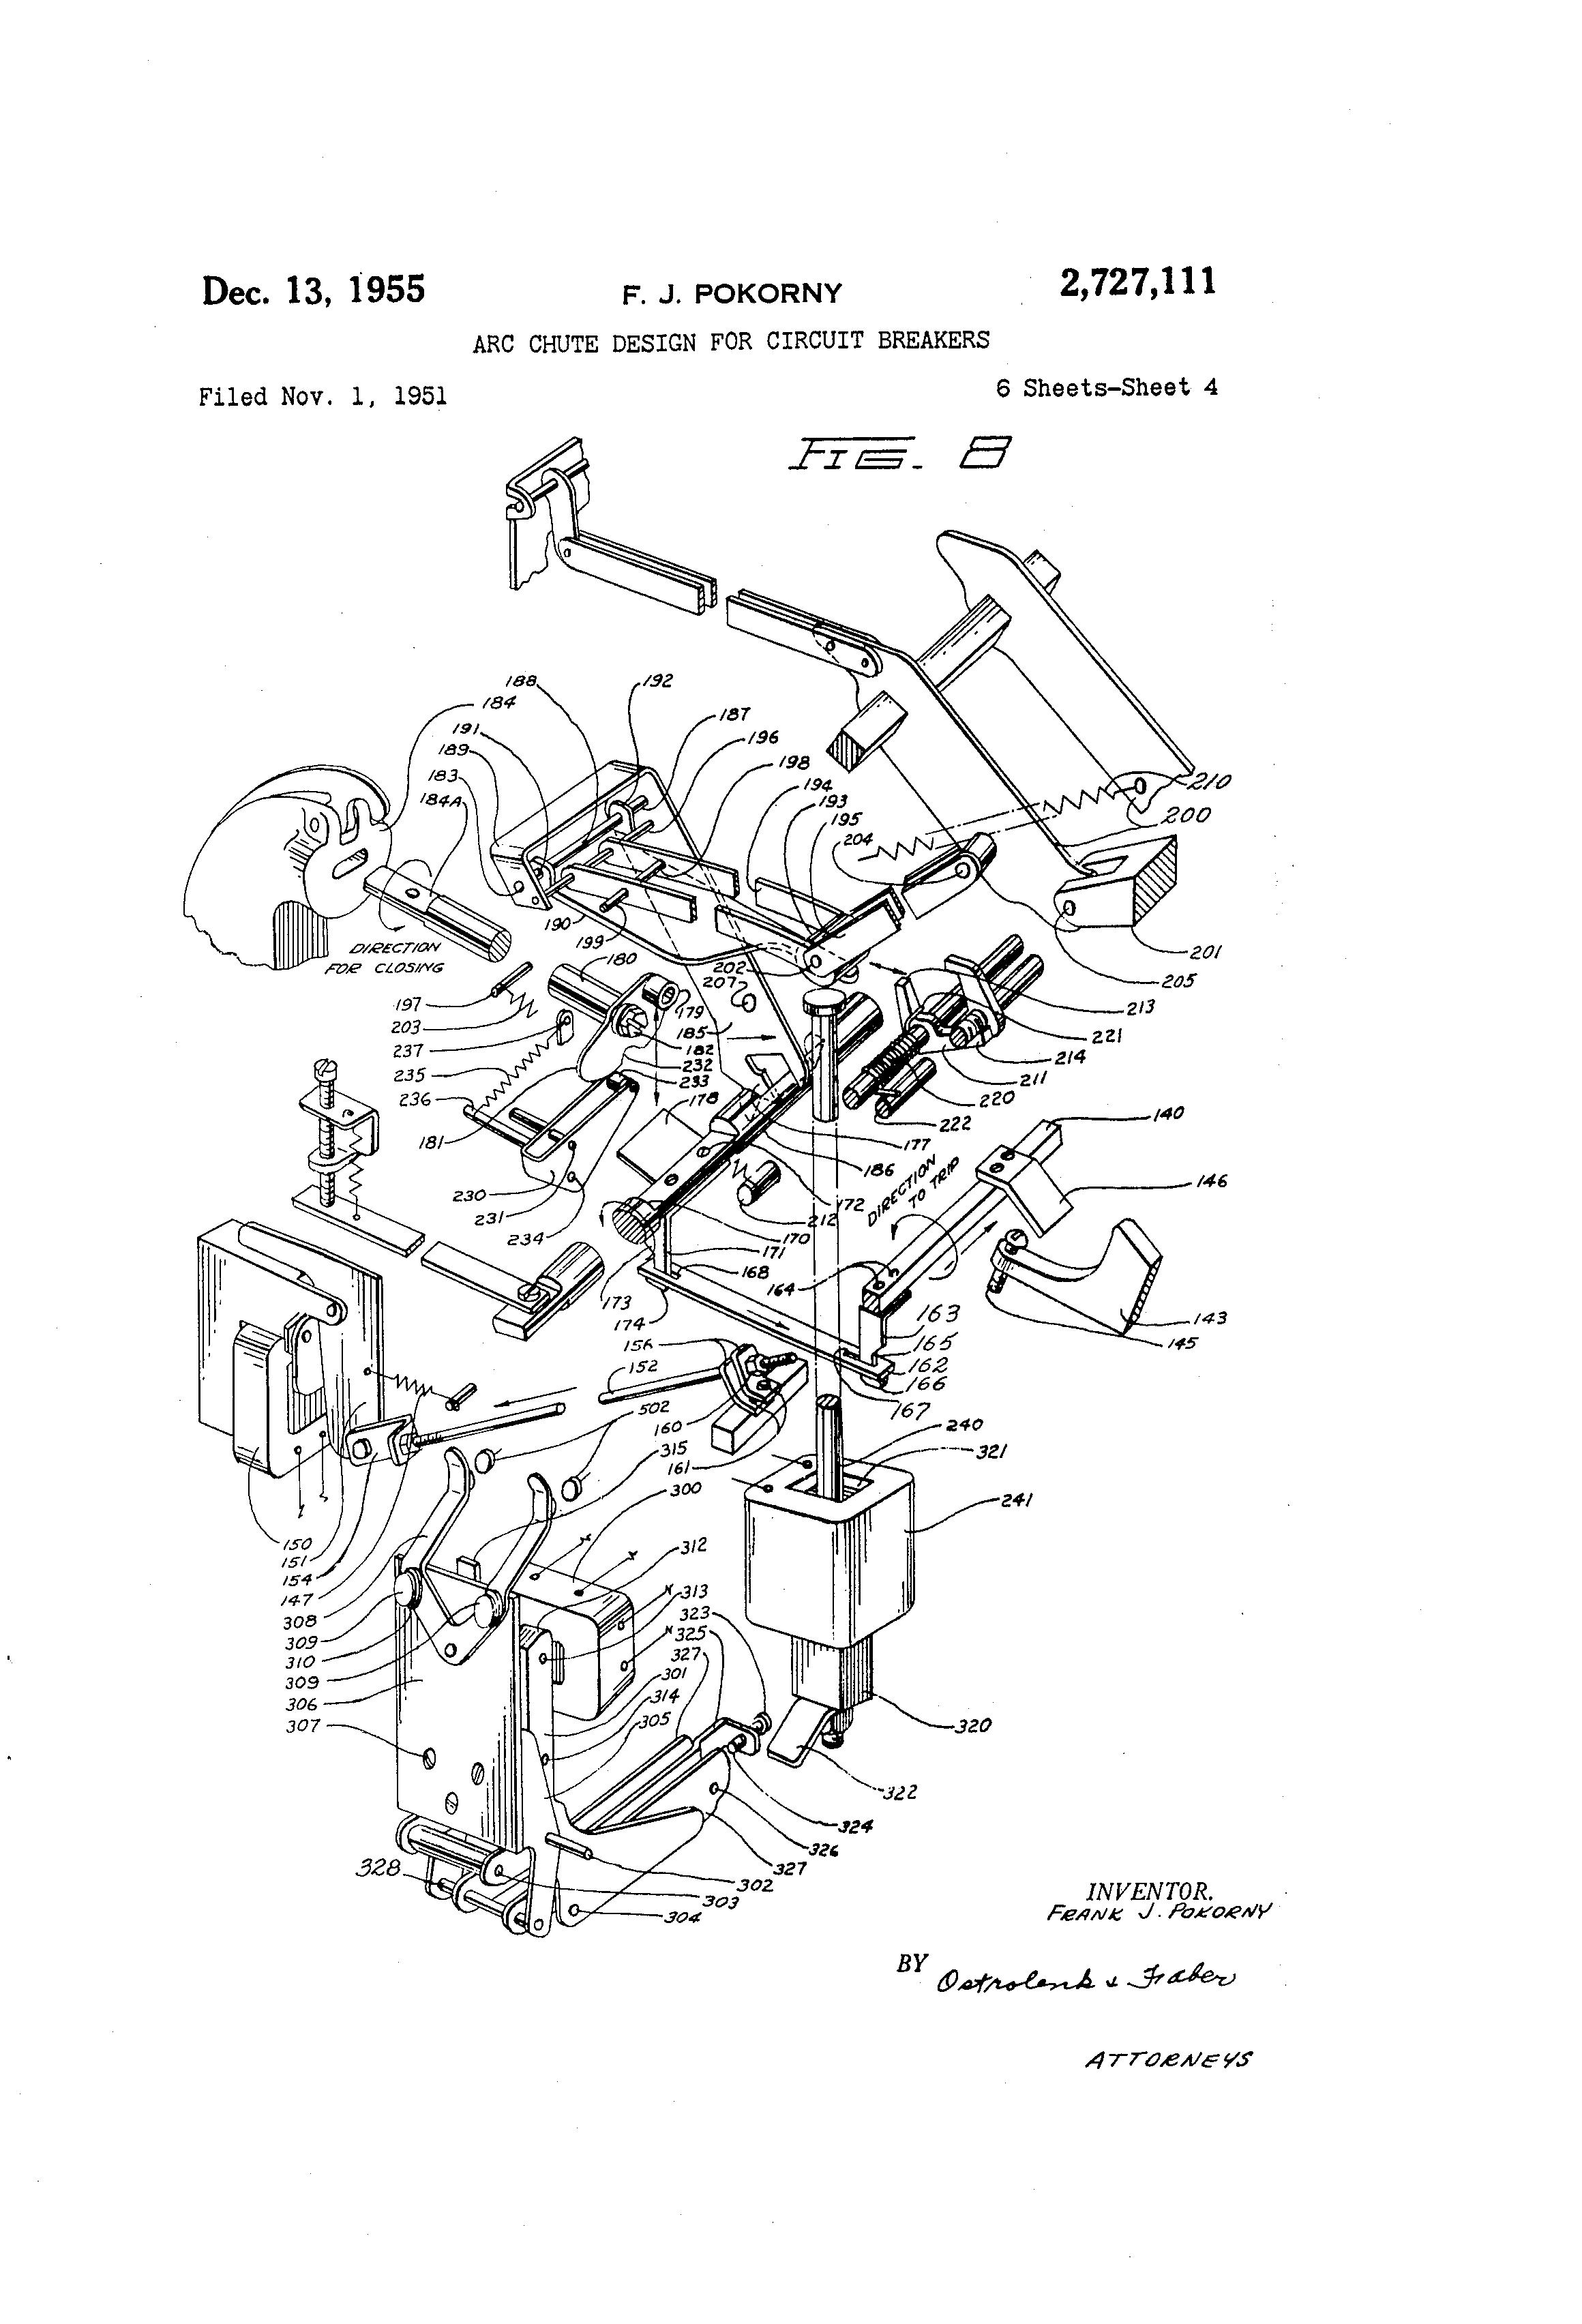 patent us2727111 - arc chute design for circuit breakers